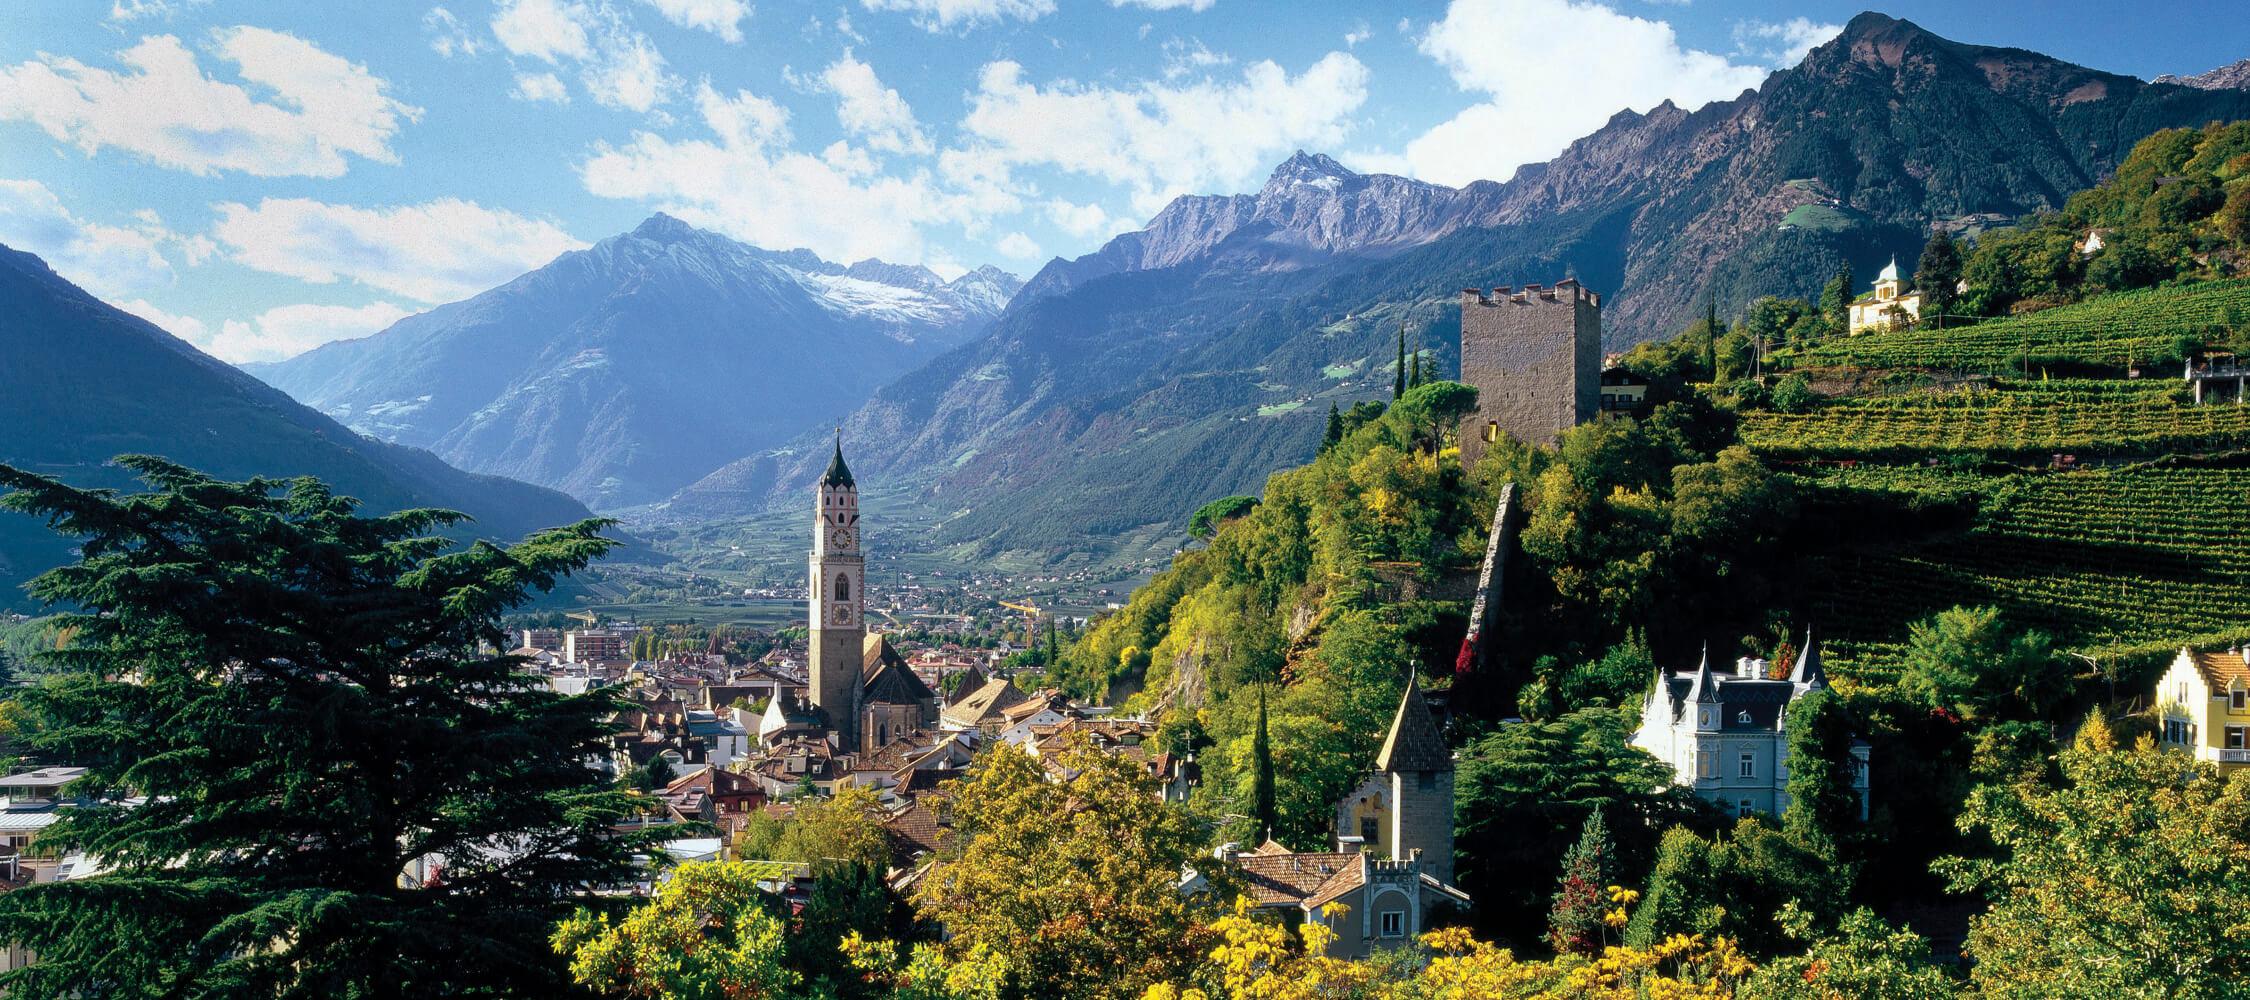 Italien-Trentino_Suedtirol_Alto_Adige_Merano_Meran_Besichtigen_Natur_Panorama_Stadt_Herbst_IDM-Clemens-Zahn_smg00521clza